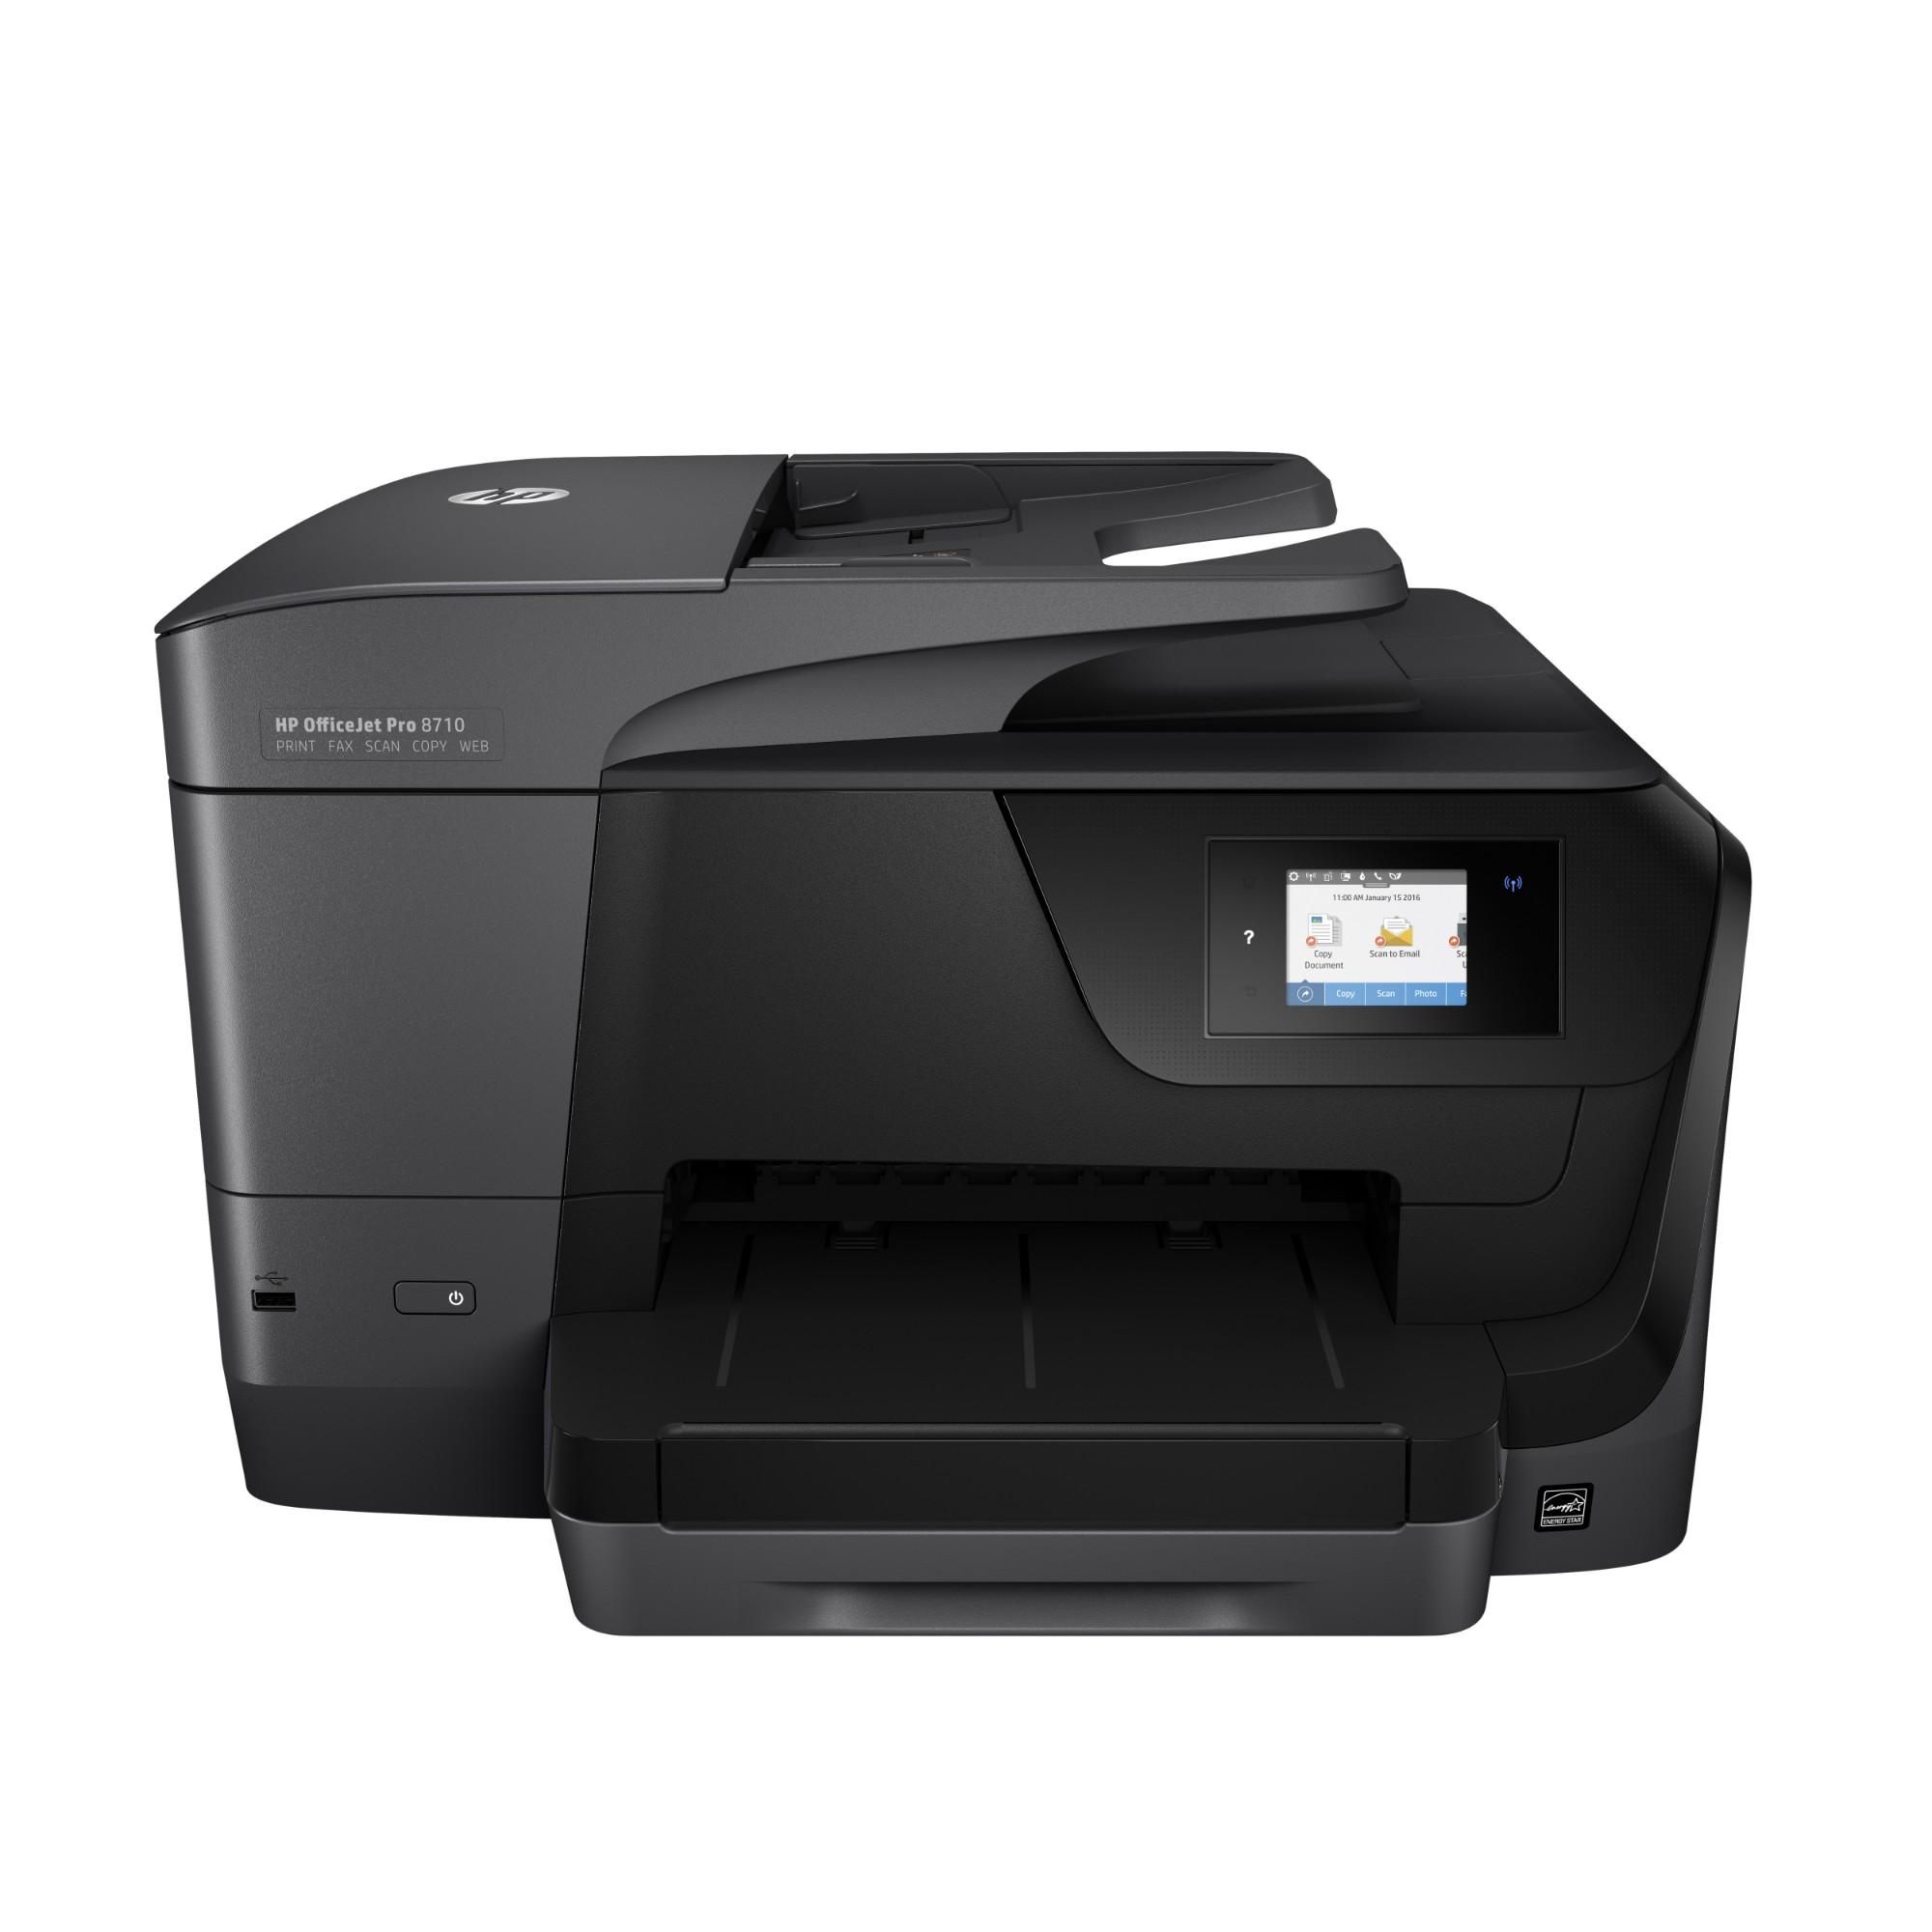 HP OfficeJet Pro 8718 4800 x 1200DPI Thermal Inkjet A4 22ppm Wi-Fi